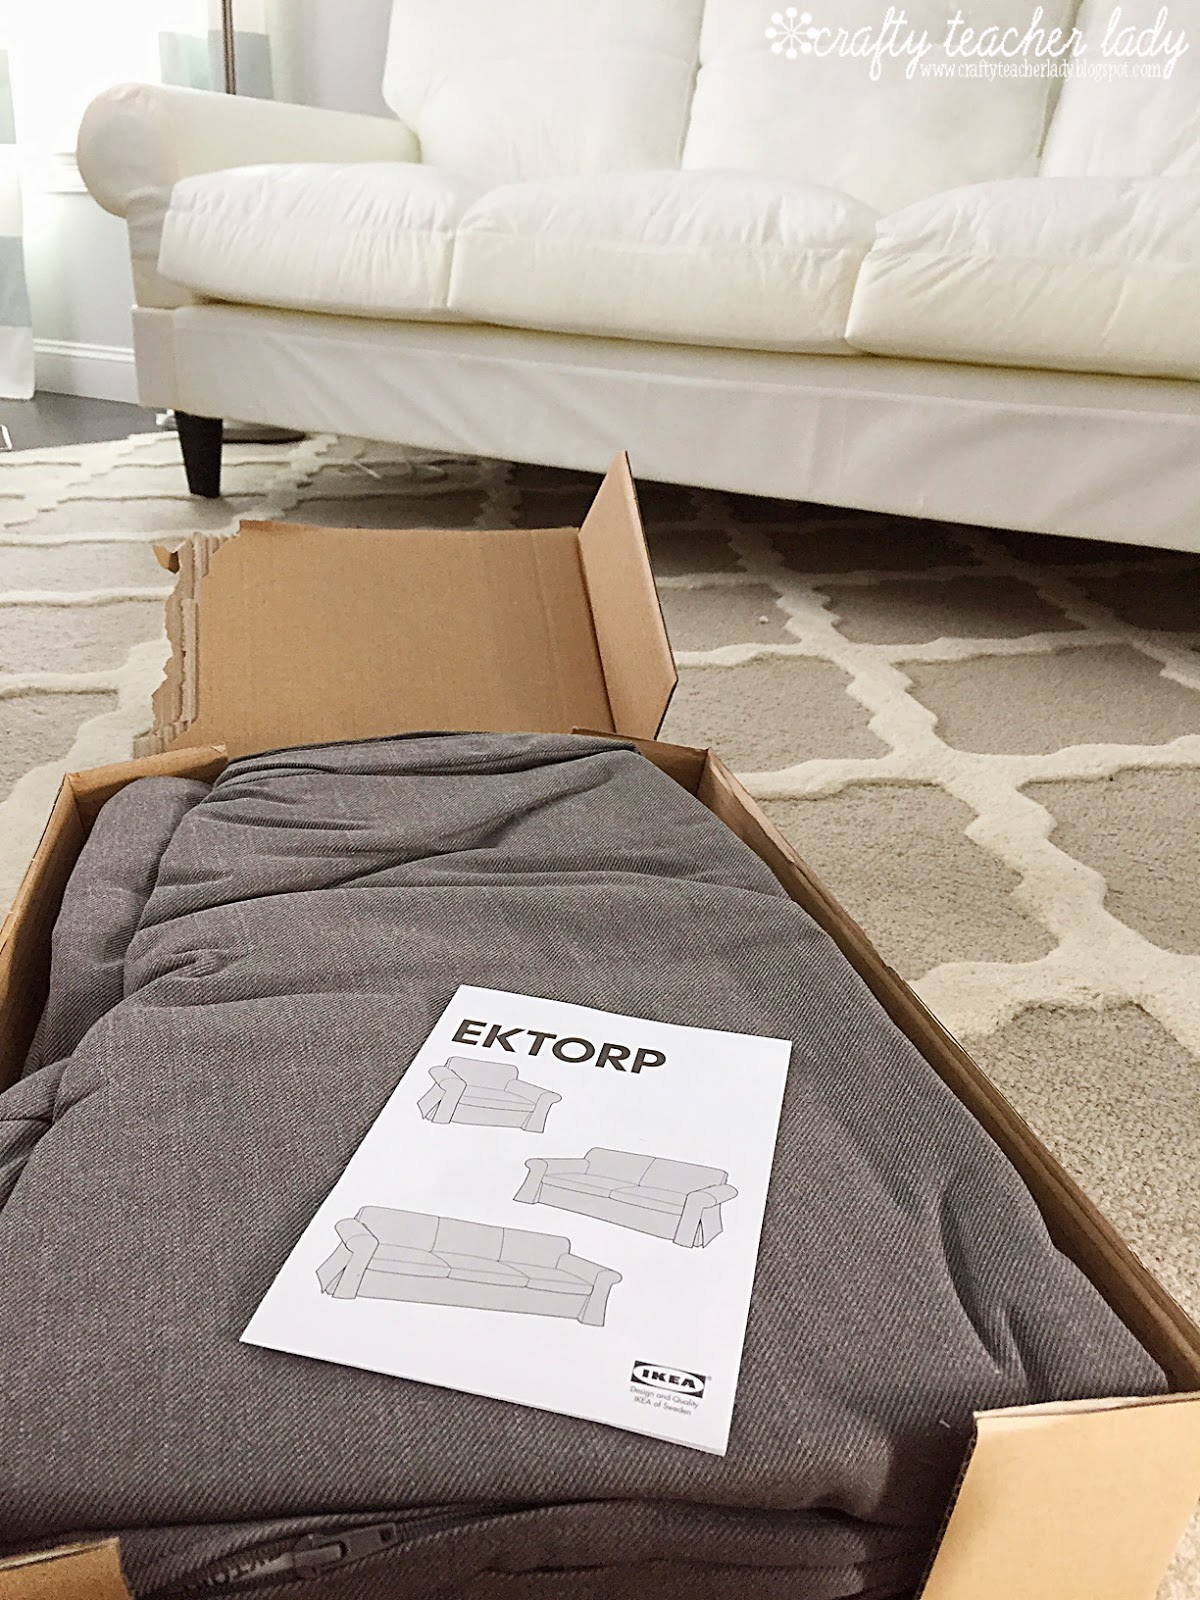 karlstad sofa blekinge white entertainment clg wiki ikea slipcover couch ektorp loveseat before with